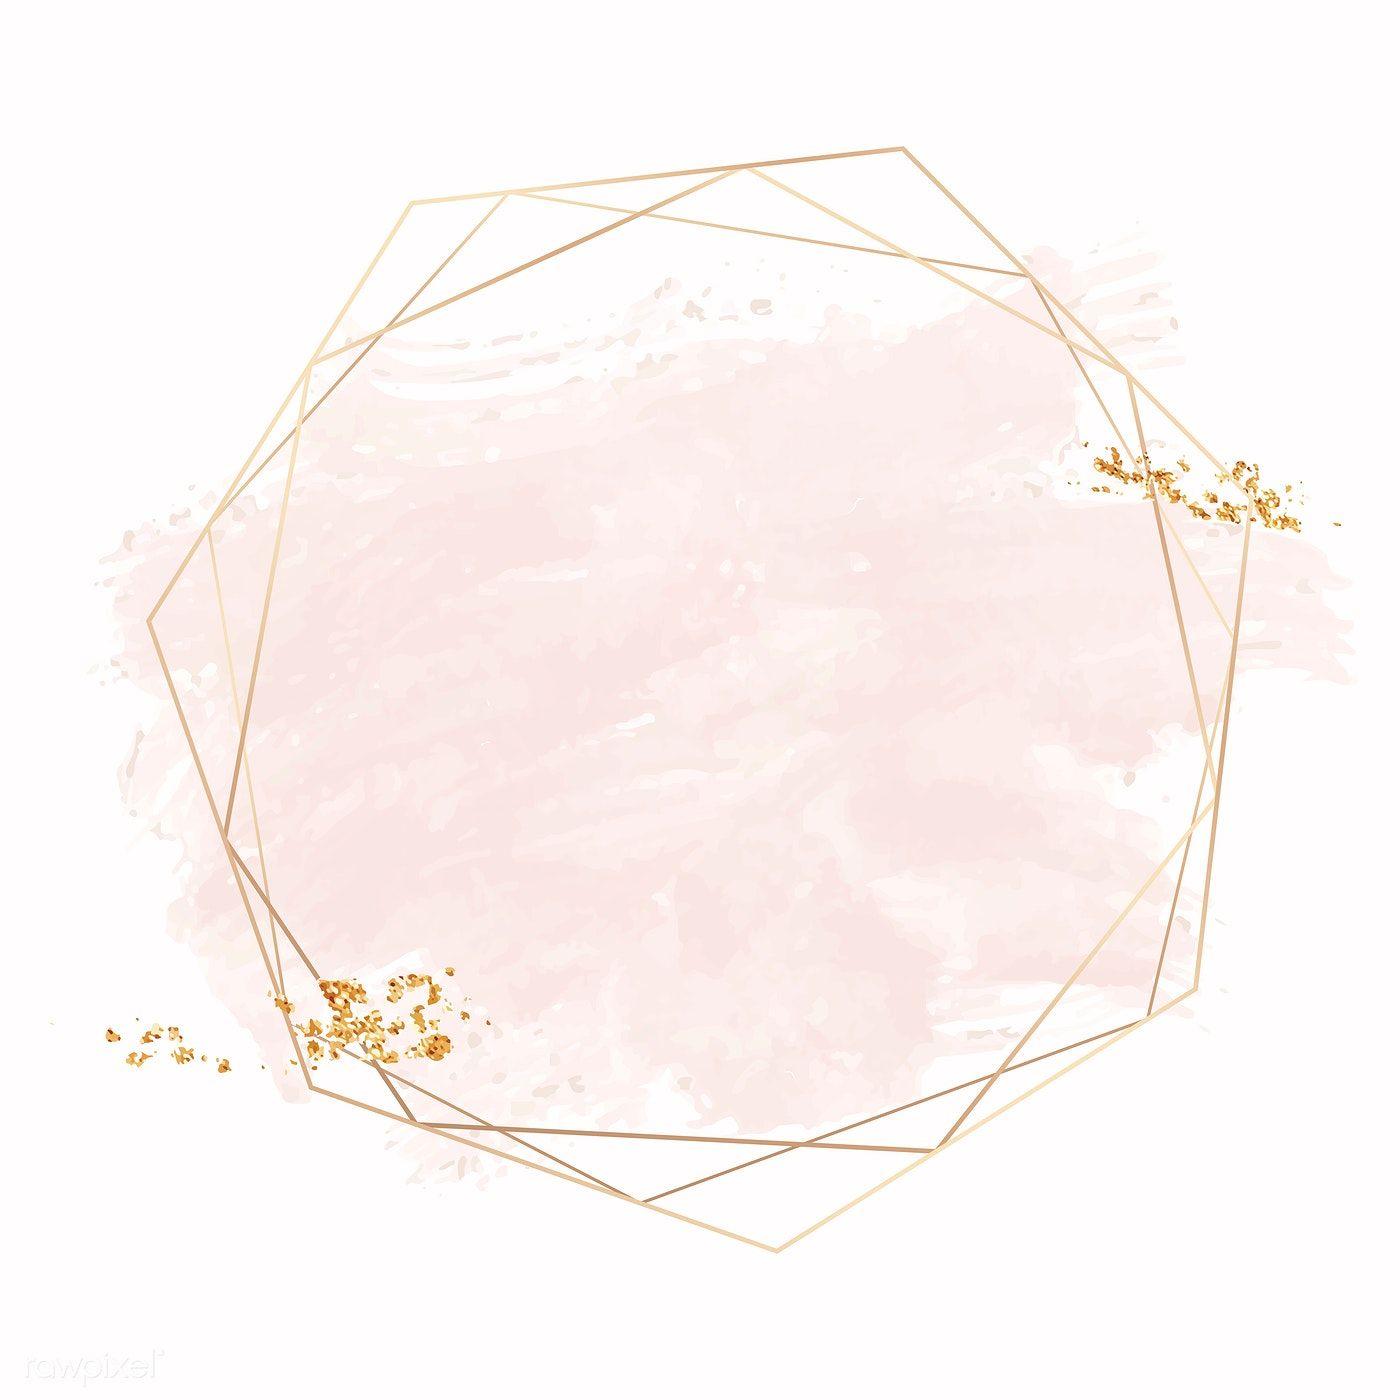 Download premium illustration of Gold geometric frame on a pink